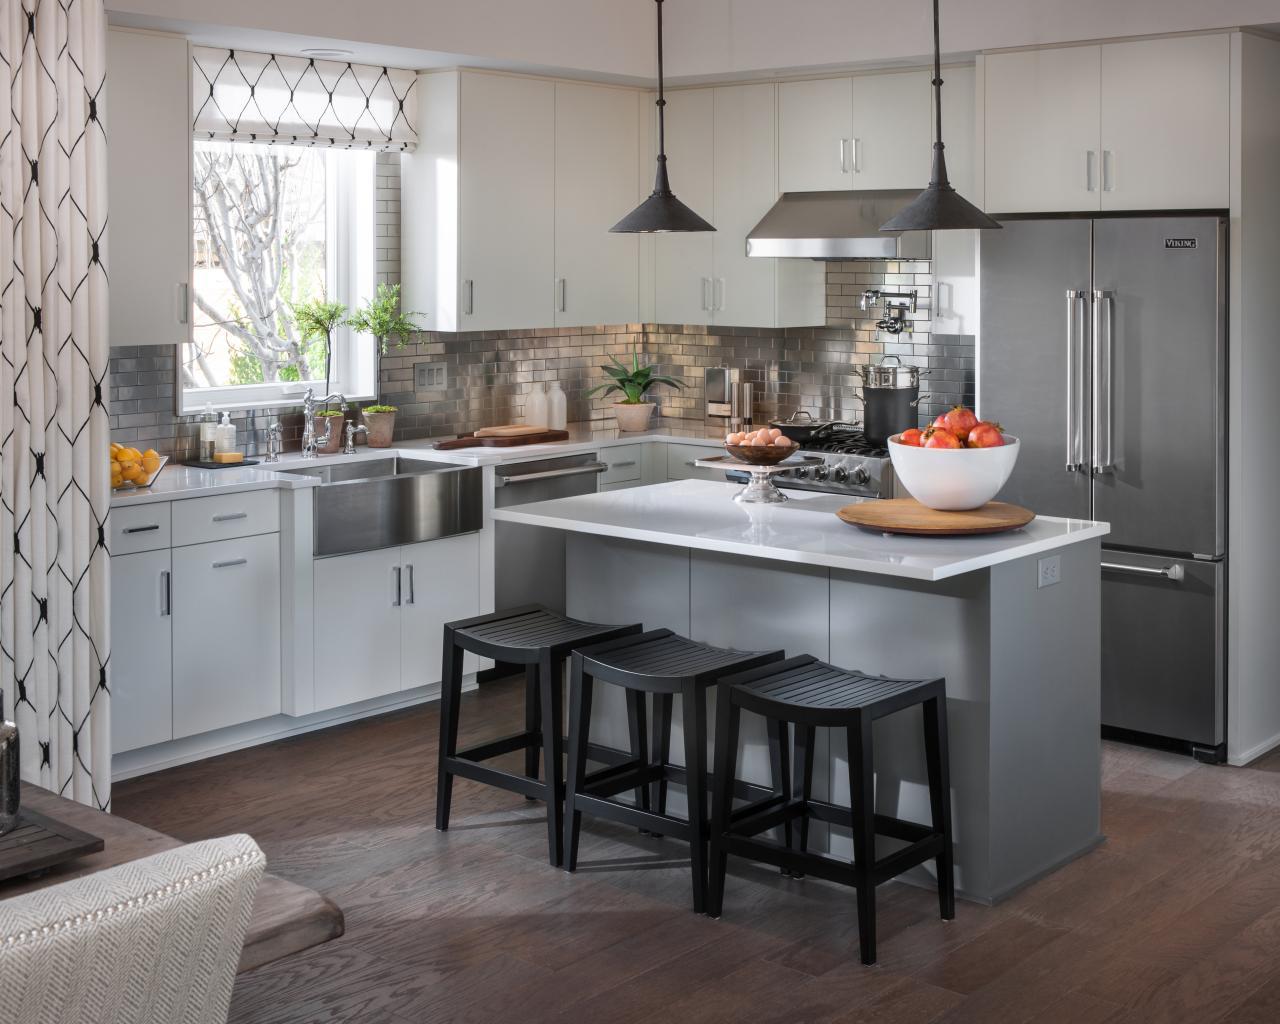 Hgtv Dream Kitchen Designs pick your favorite kitchen | hgtv smart home 2017 | hgtv